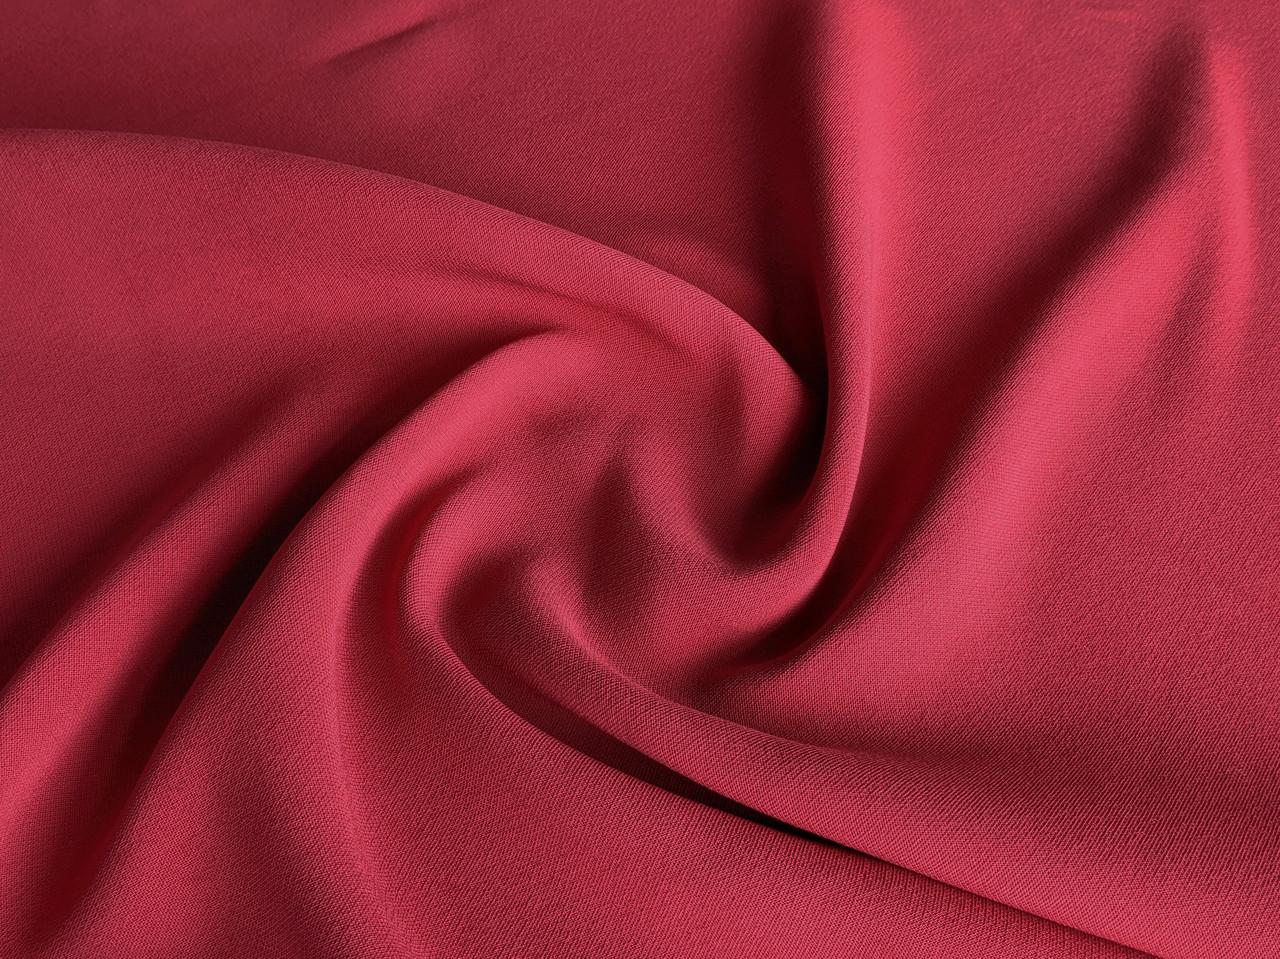 Ткань Дабл креп, красный коралл